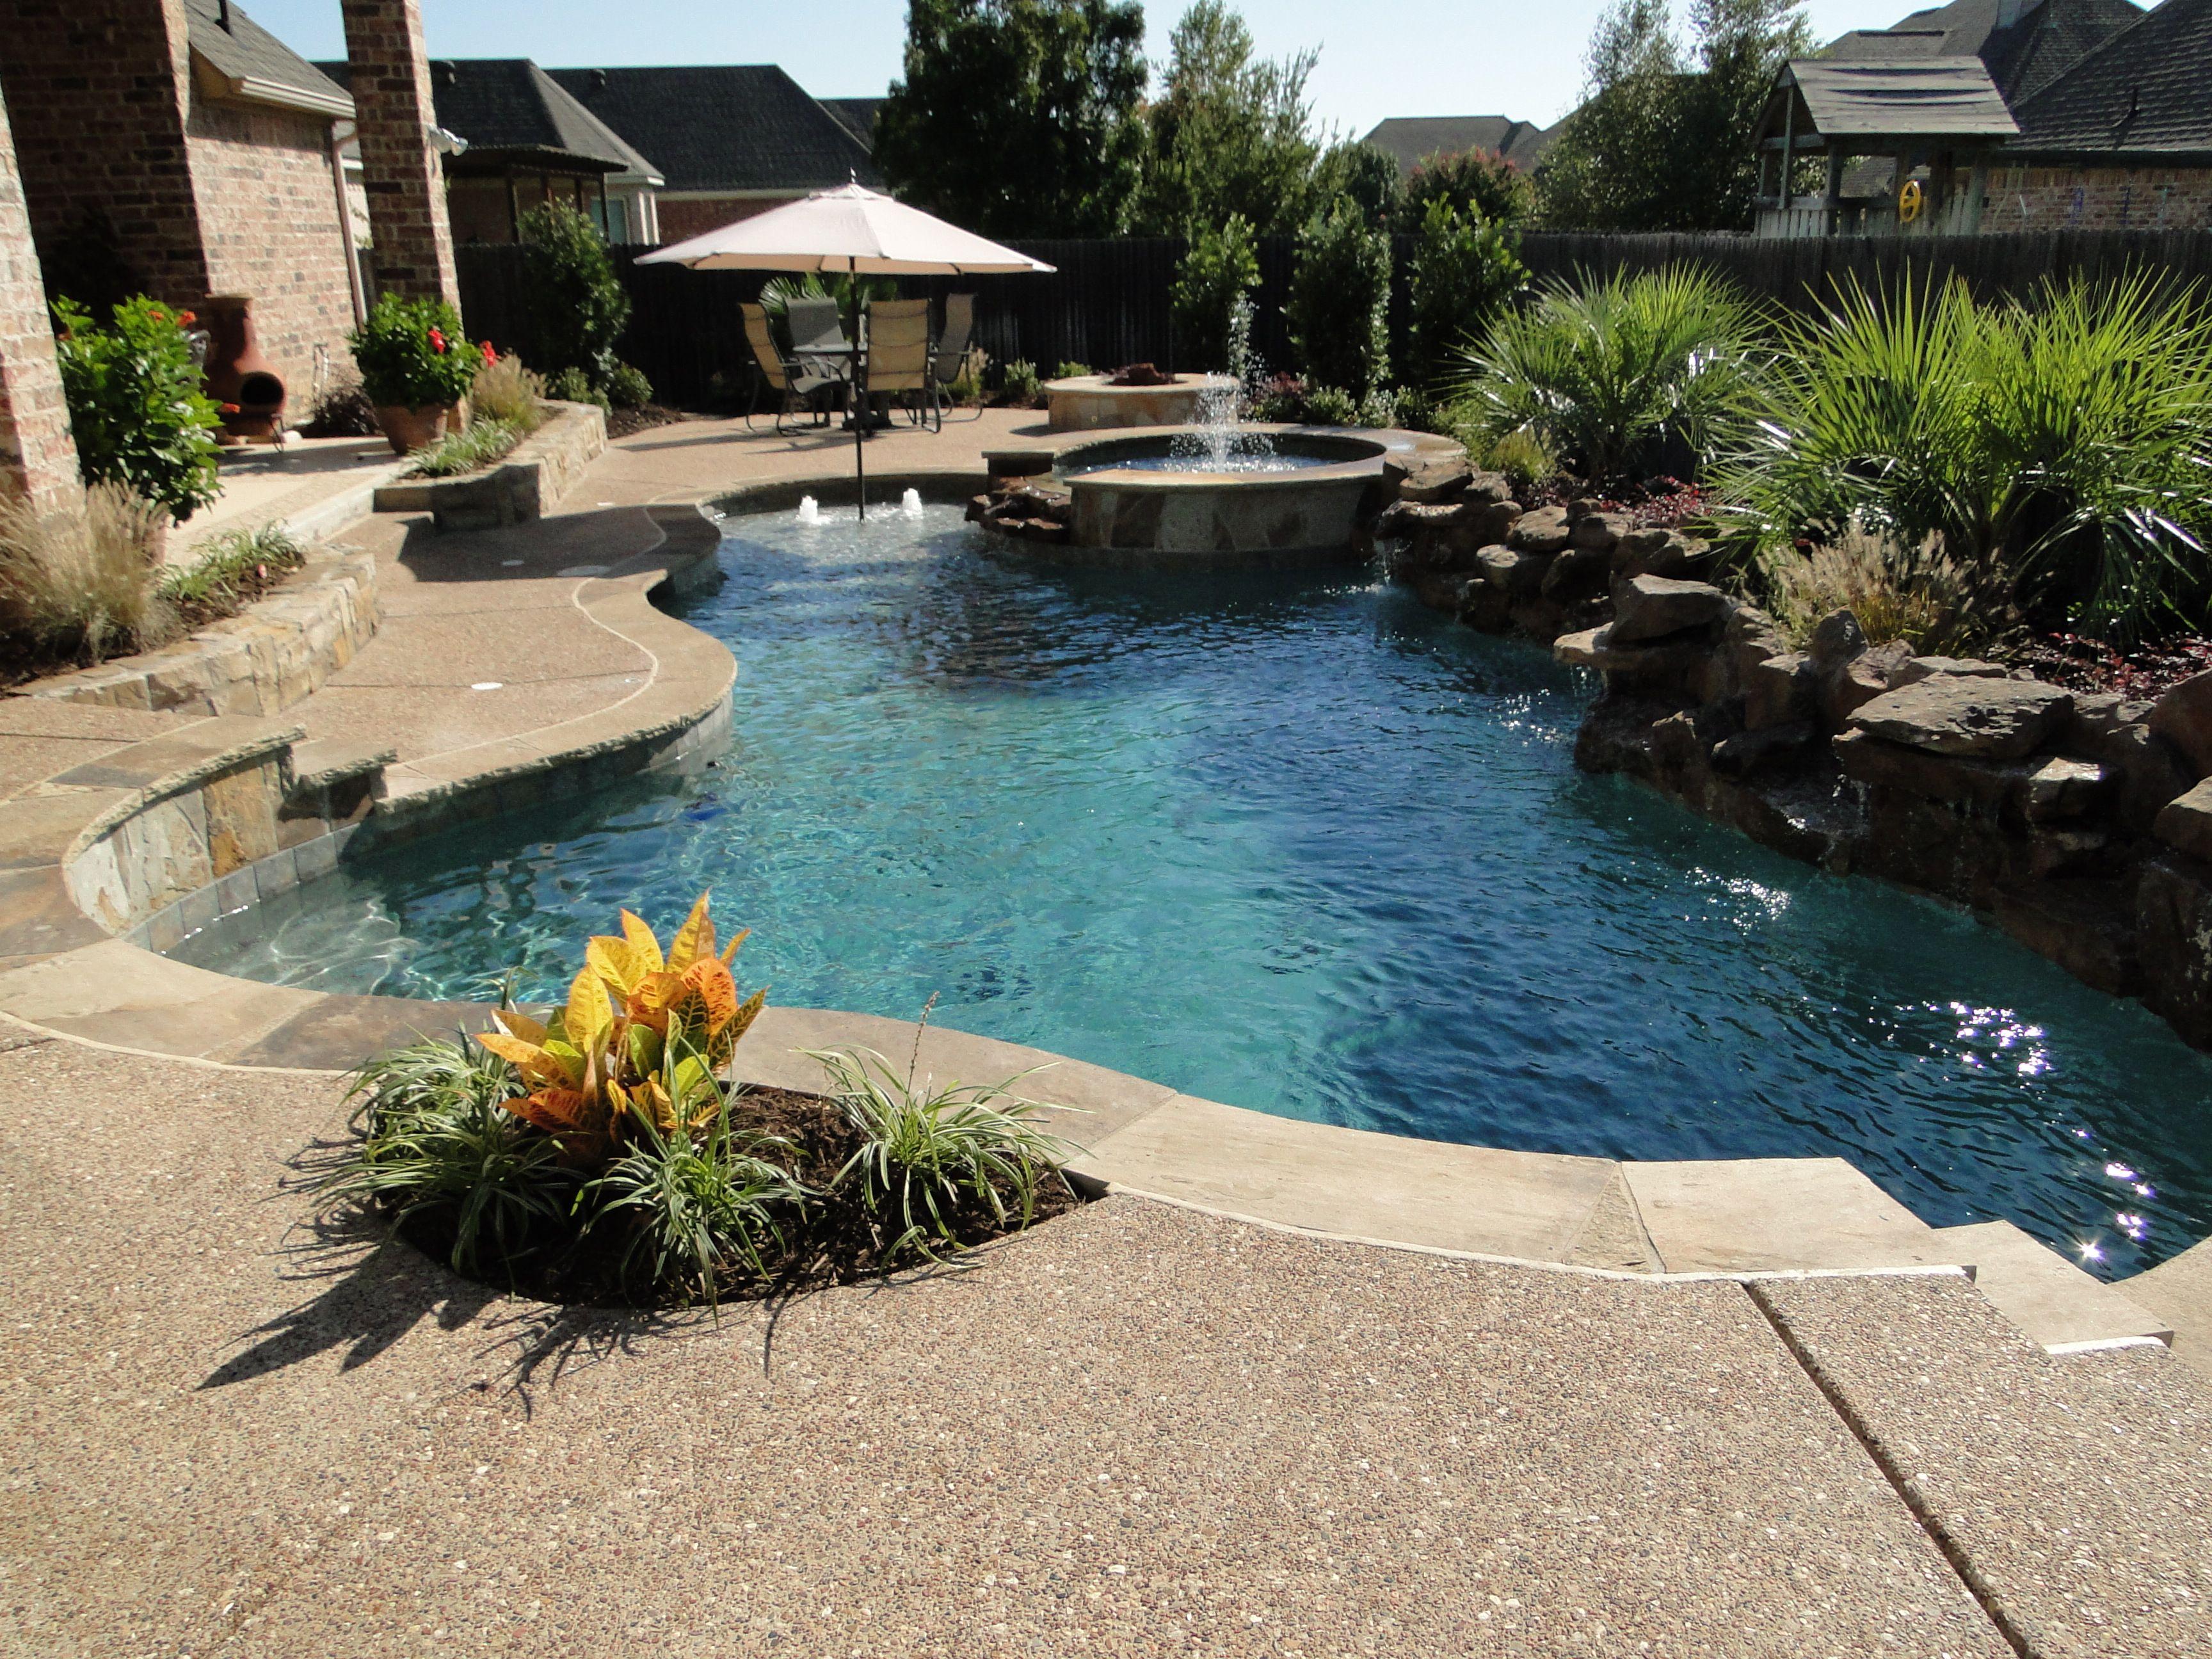 Modern Natural Pool Design Google Search Small Backyard Pools